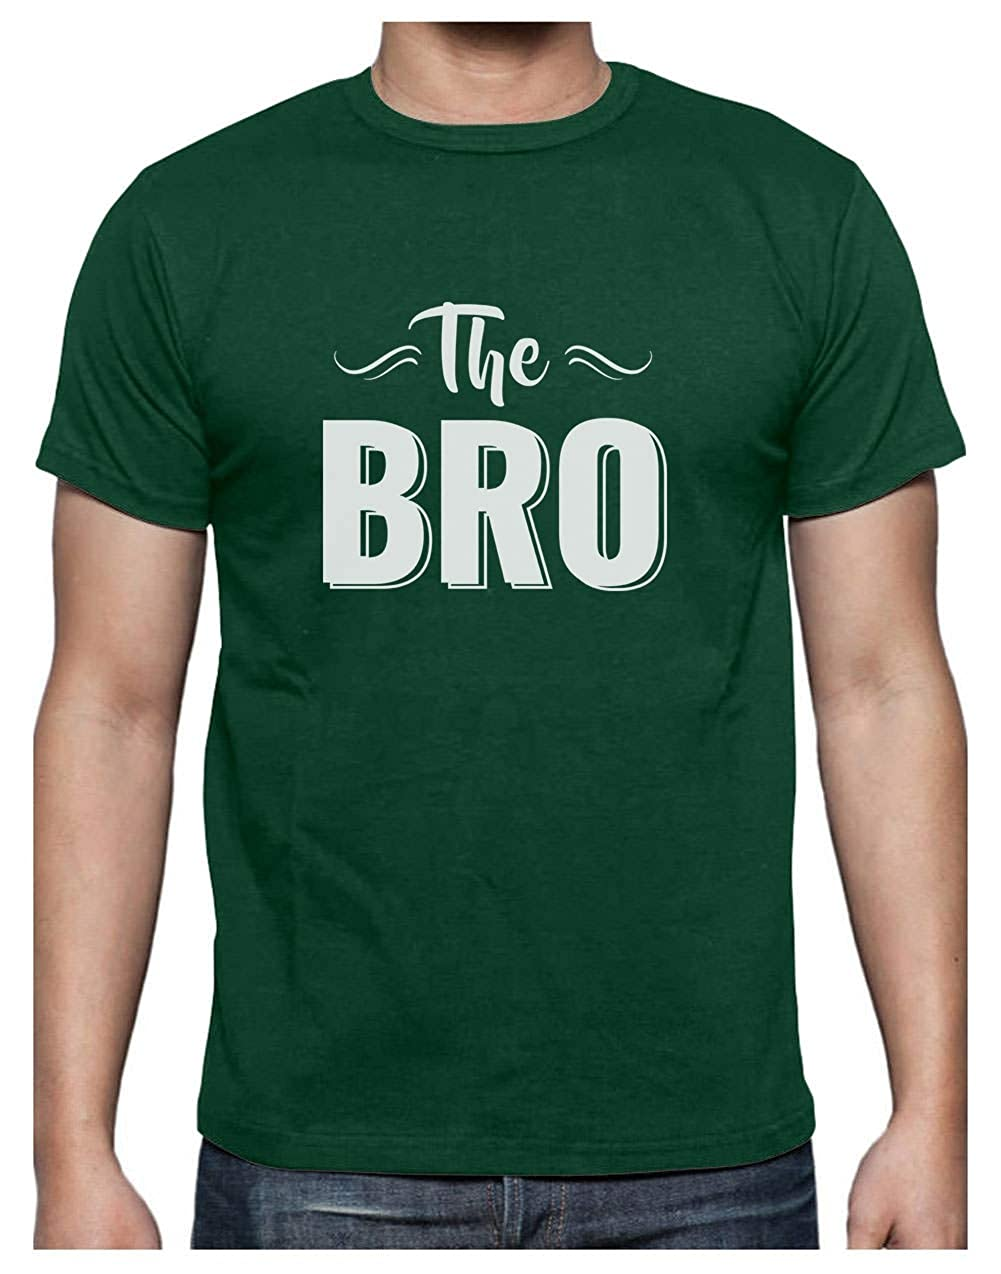 Cadeau frere idees Cadeaux Homme Tee Shirt The Bro T-Shirt Homme